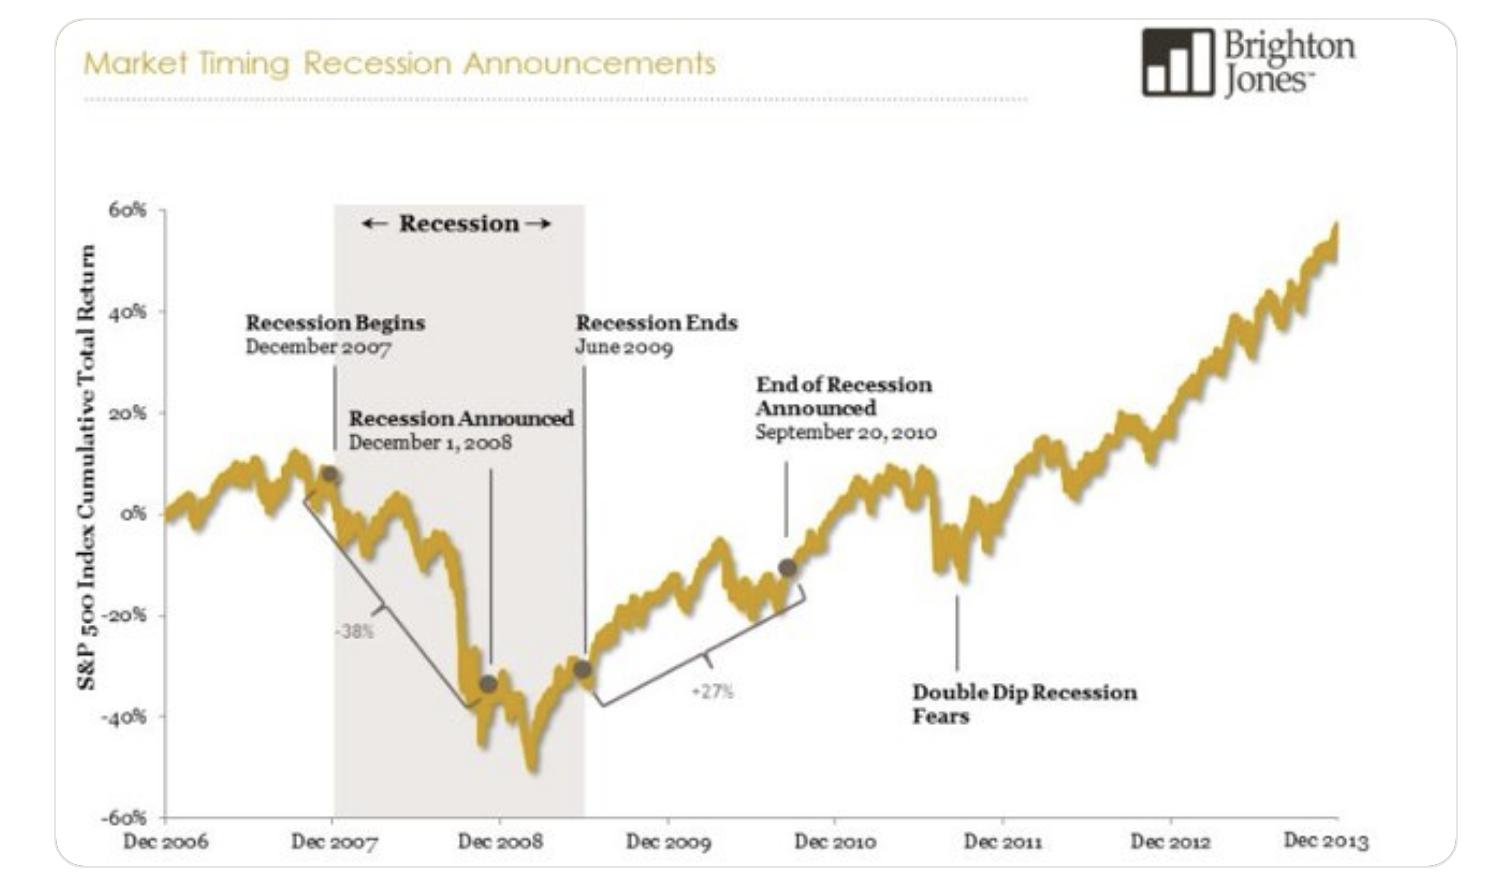 Market recession